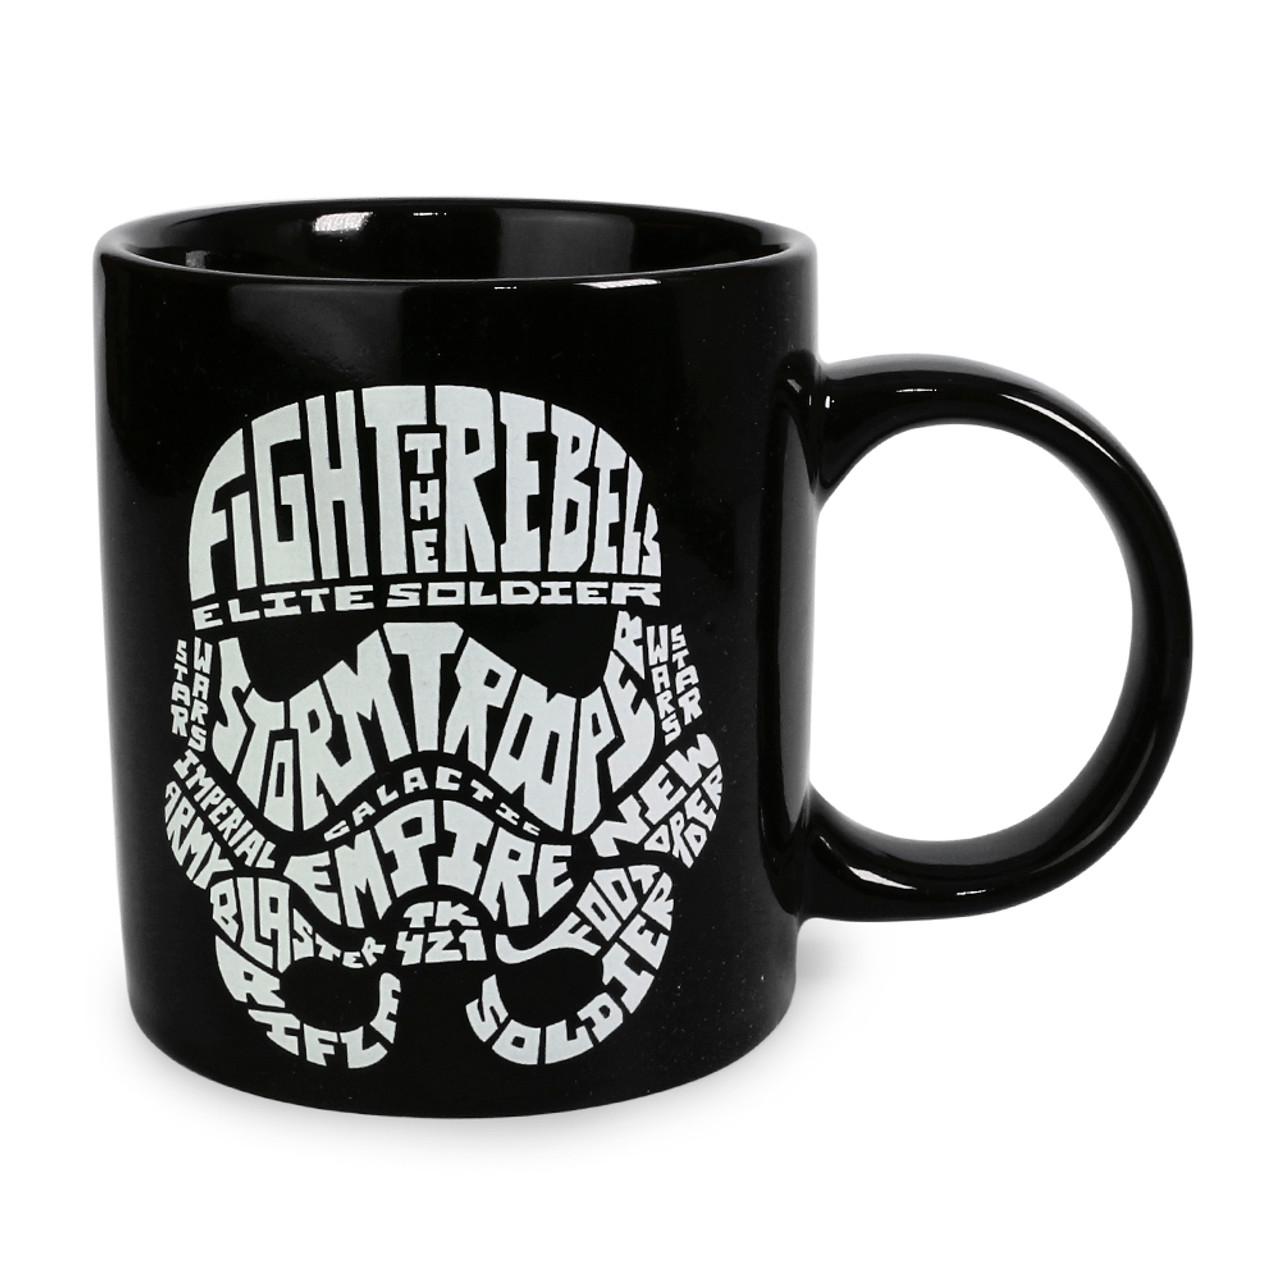 Star Wars Stormtrooper Typography Black Ceramic Mug ( Front View )